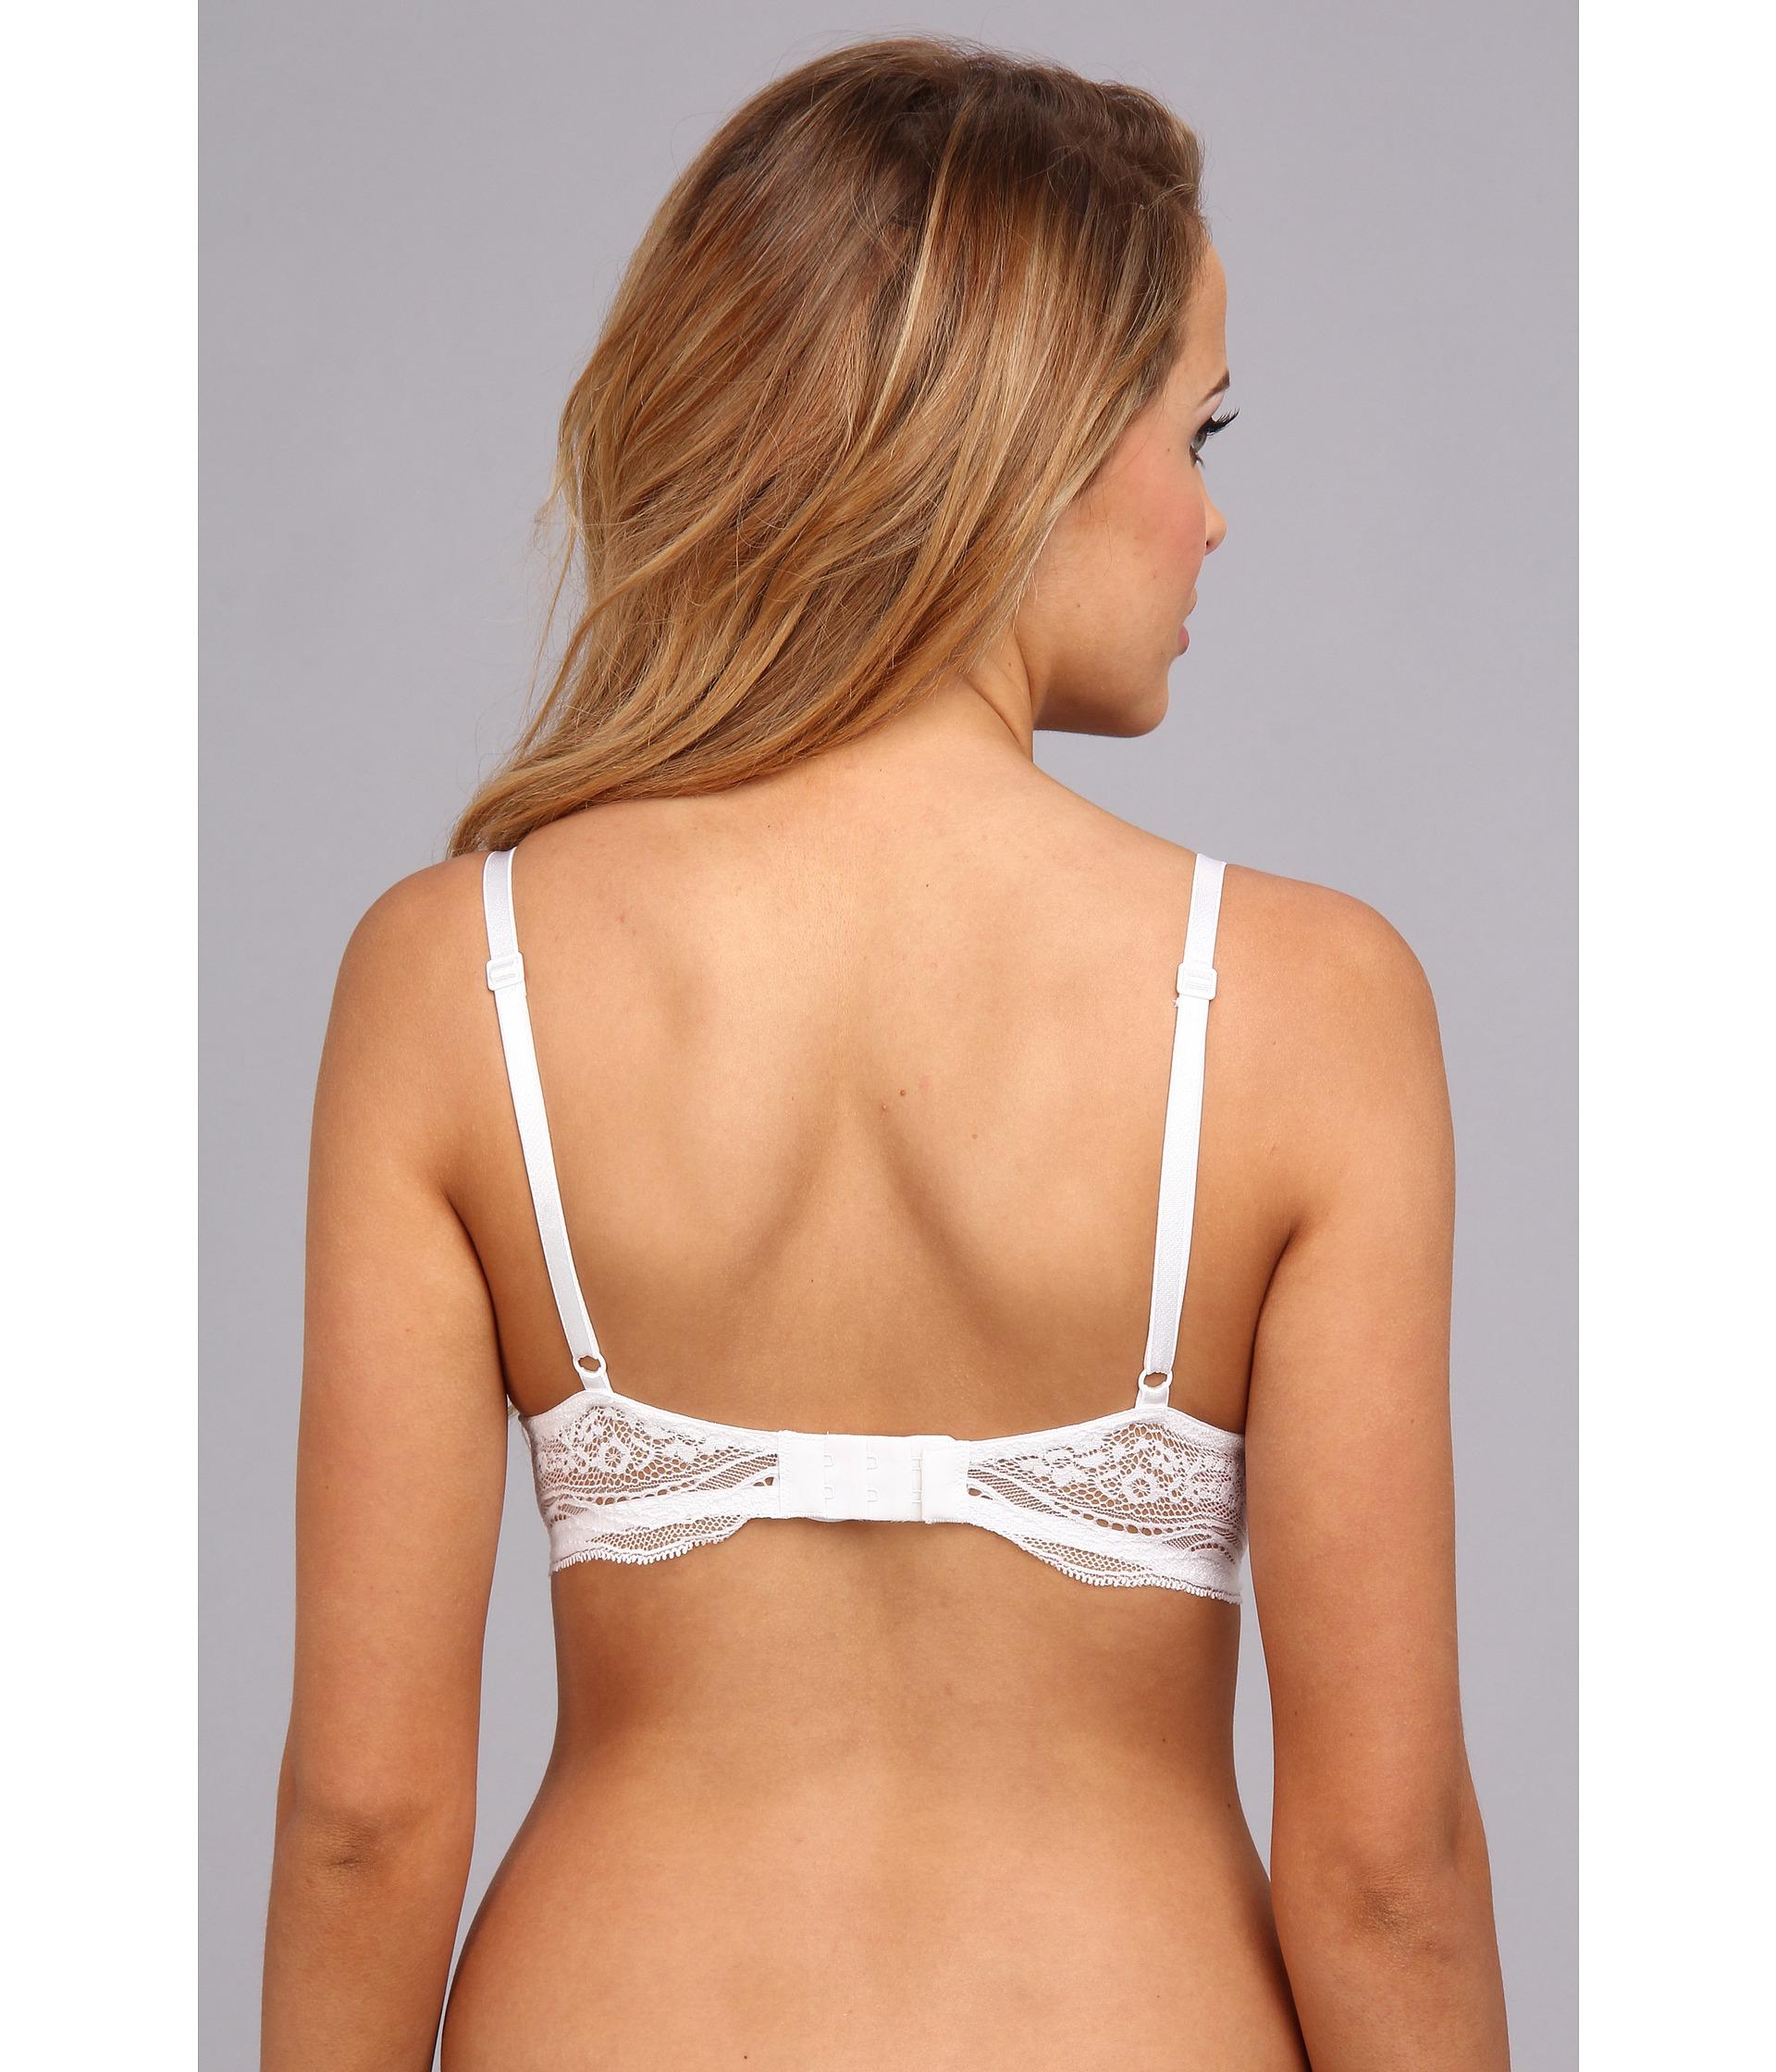 80ed813d87 Lyst - Calvin Klein Infinite Lace Customized Lift Bra F3895 in White